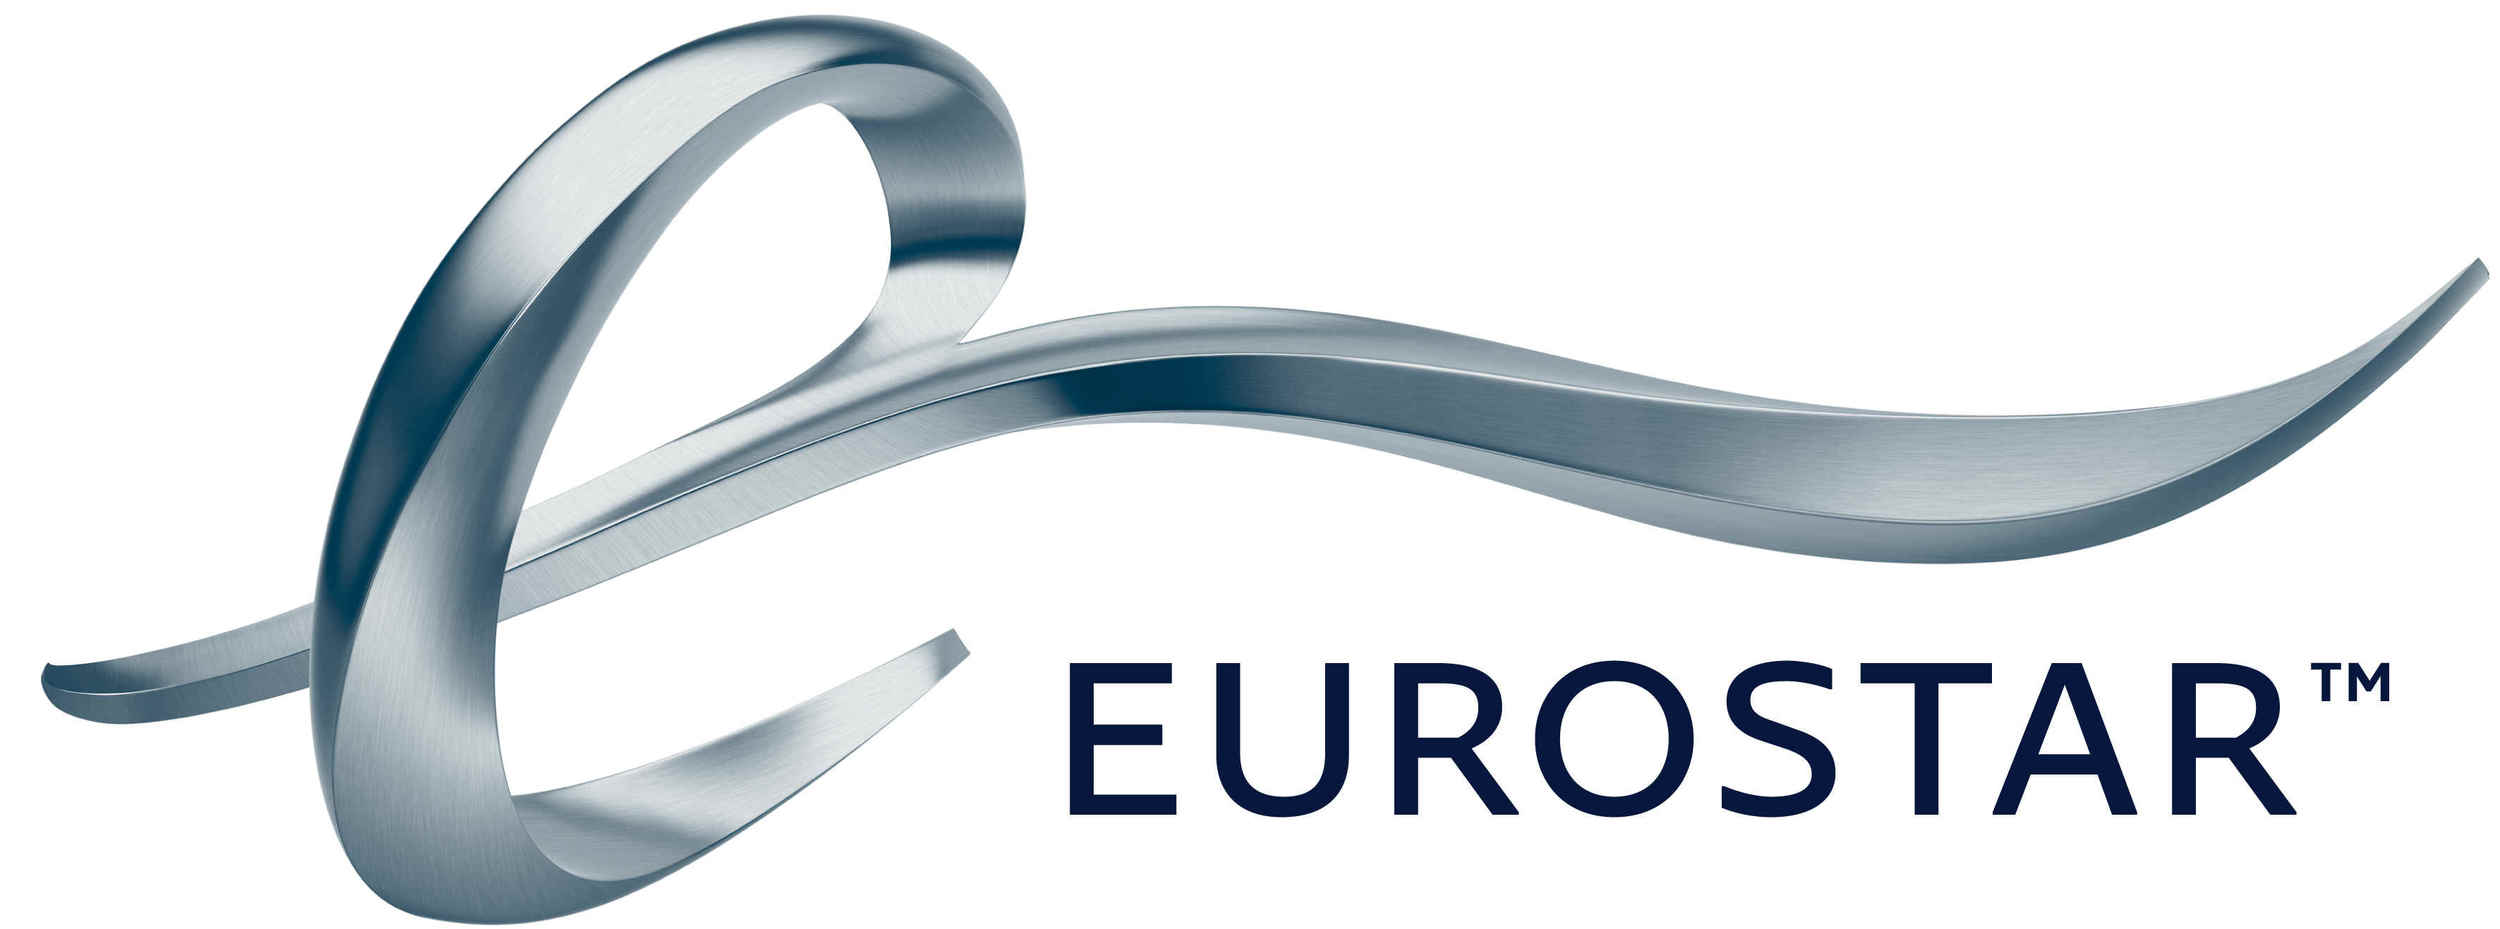 E-core-logo-largelow.jpg